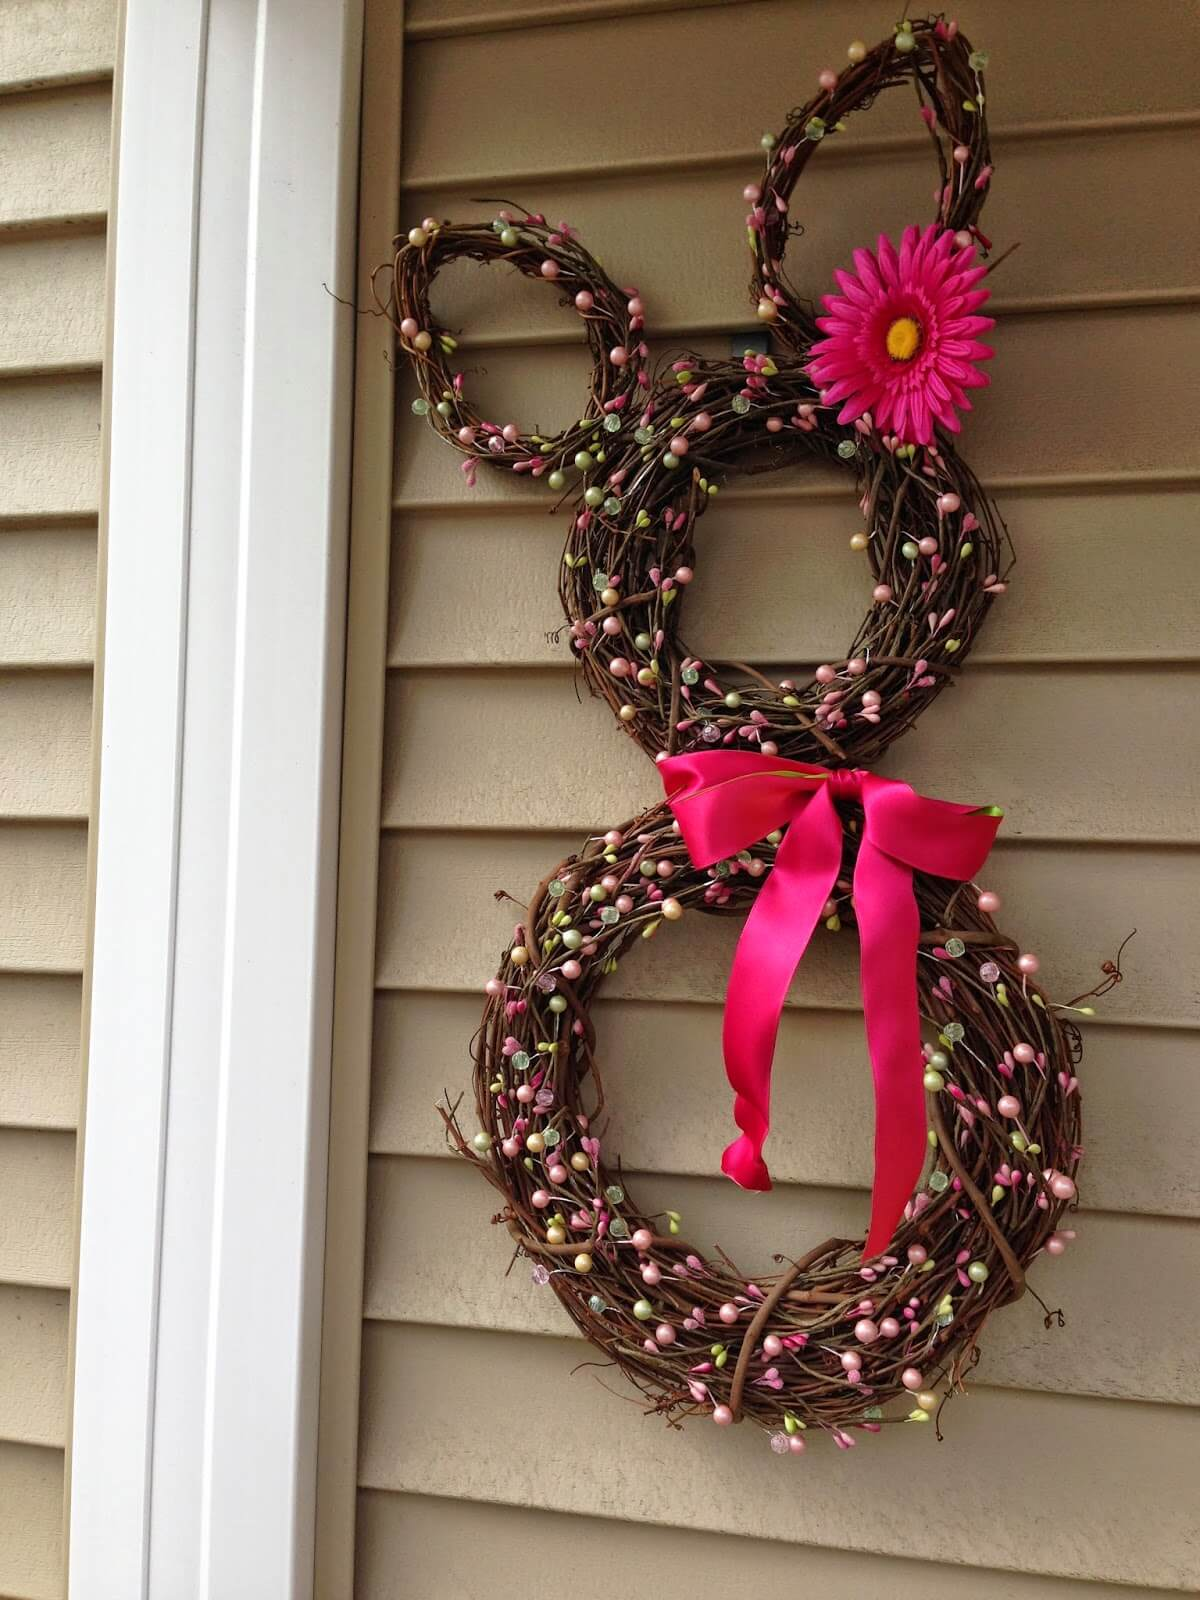 02-diy-easter-decorations-crafts-homebnc